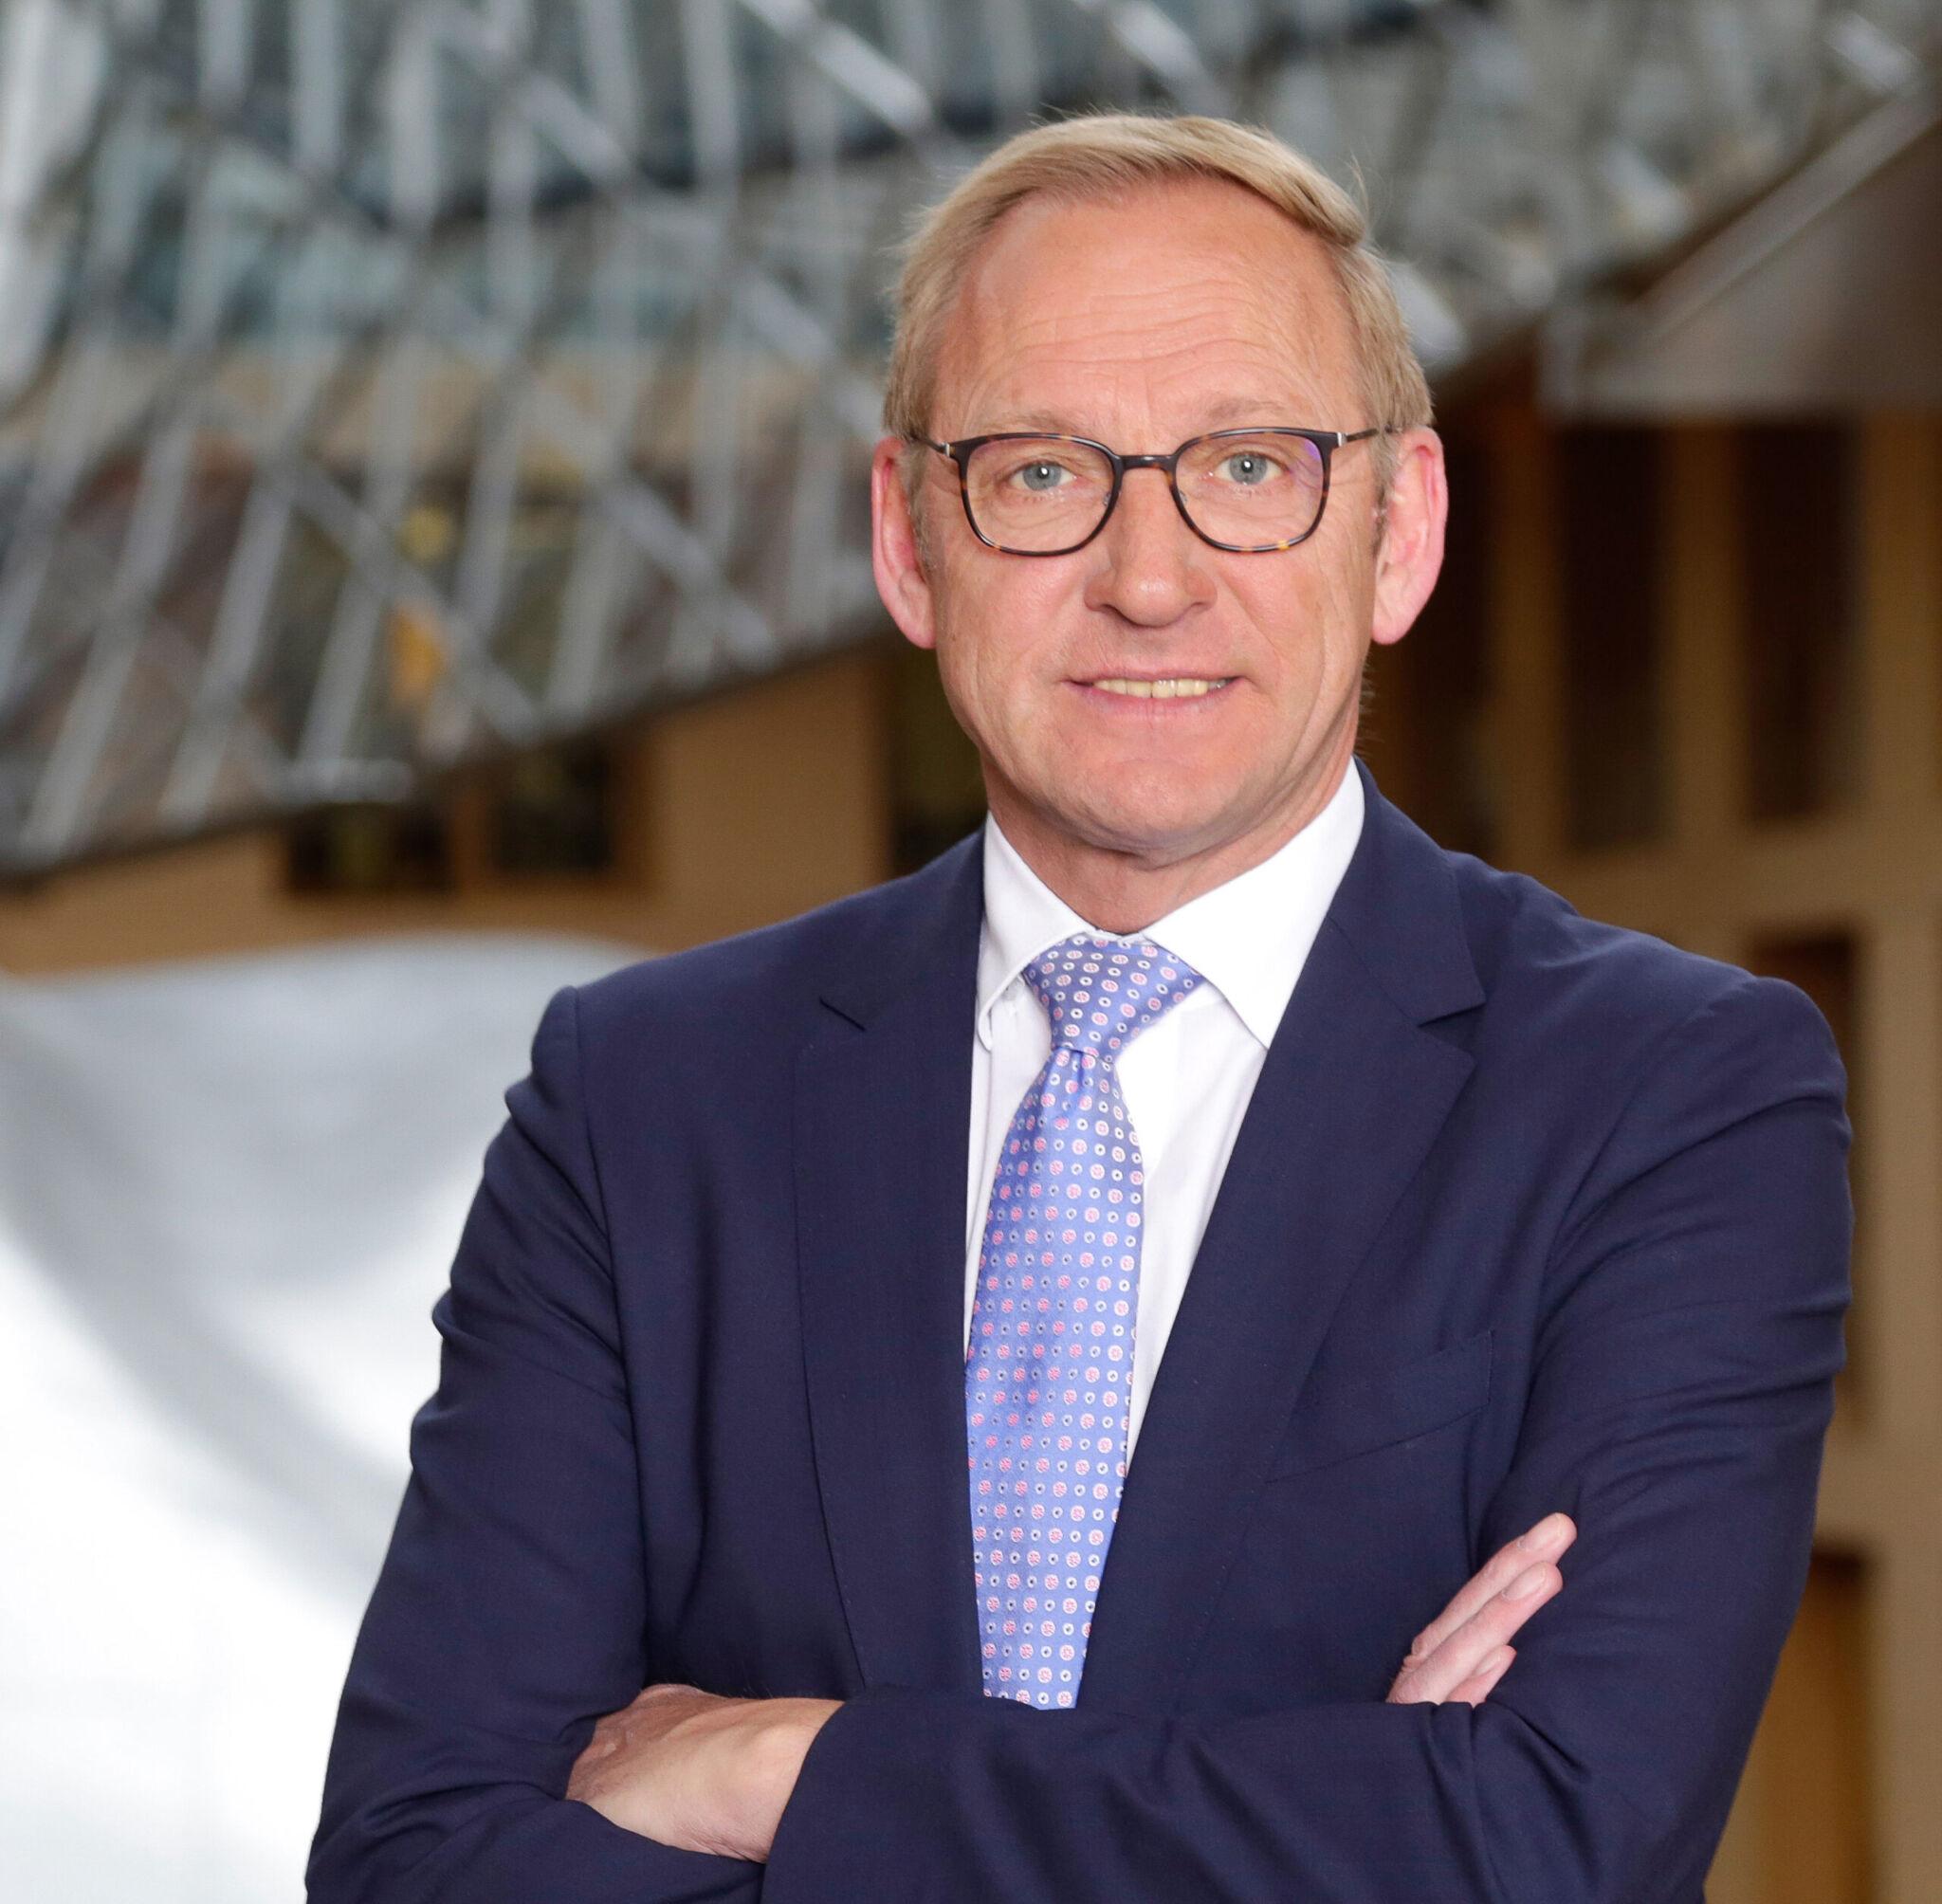 DRV-Präsident Franz-Josef Holzenkamp|copyright: Werkbild